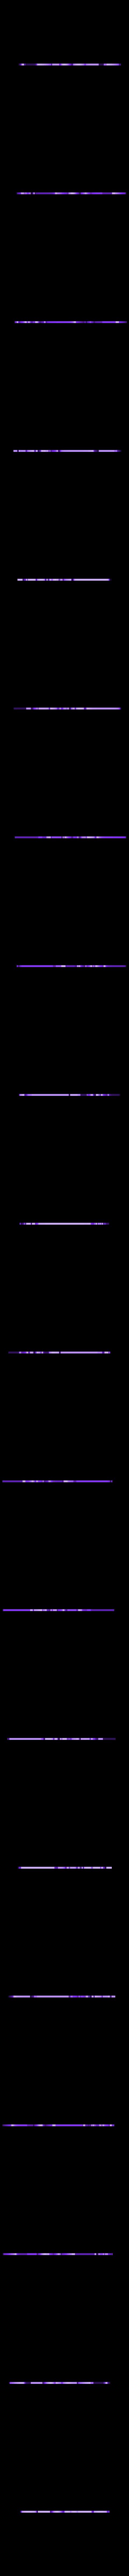 jeep v1.stl Download STL file Jeep logo • 3D printable template, turnerw006